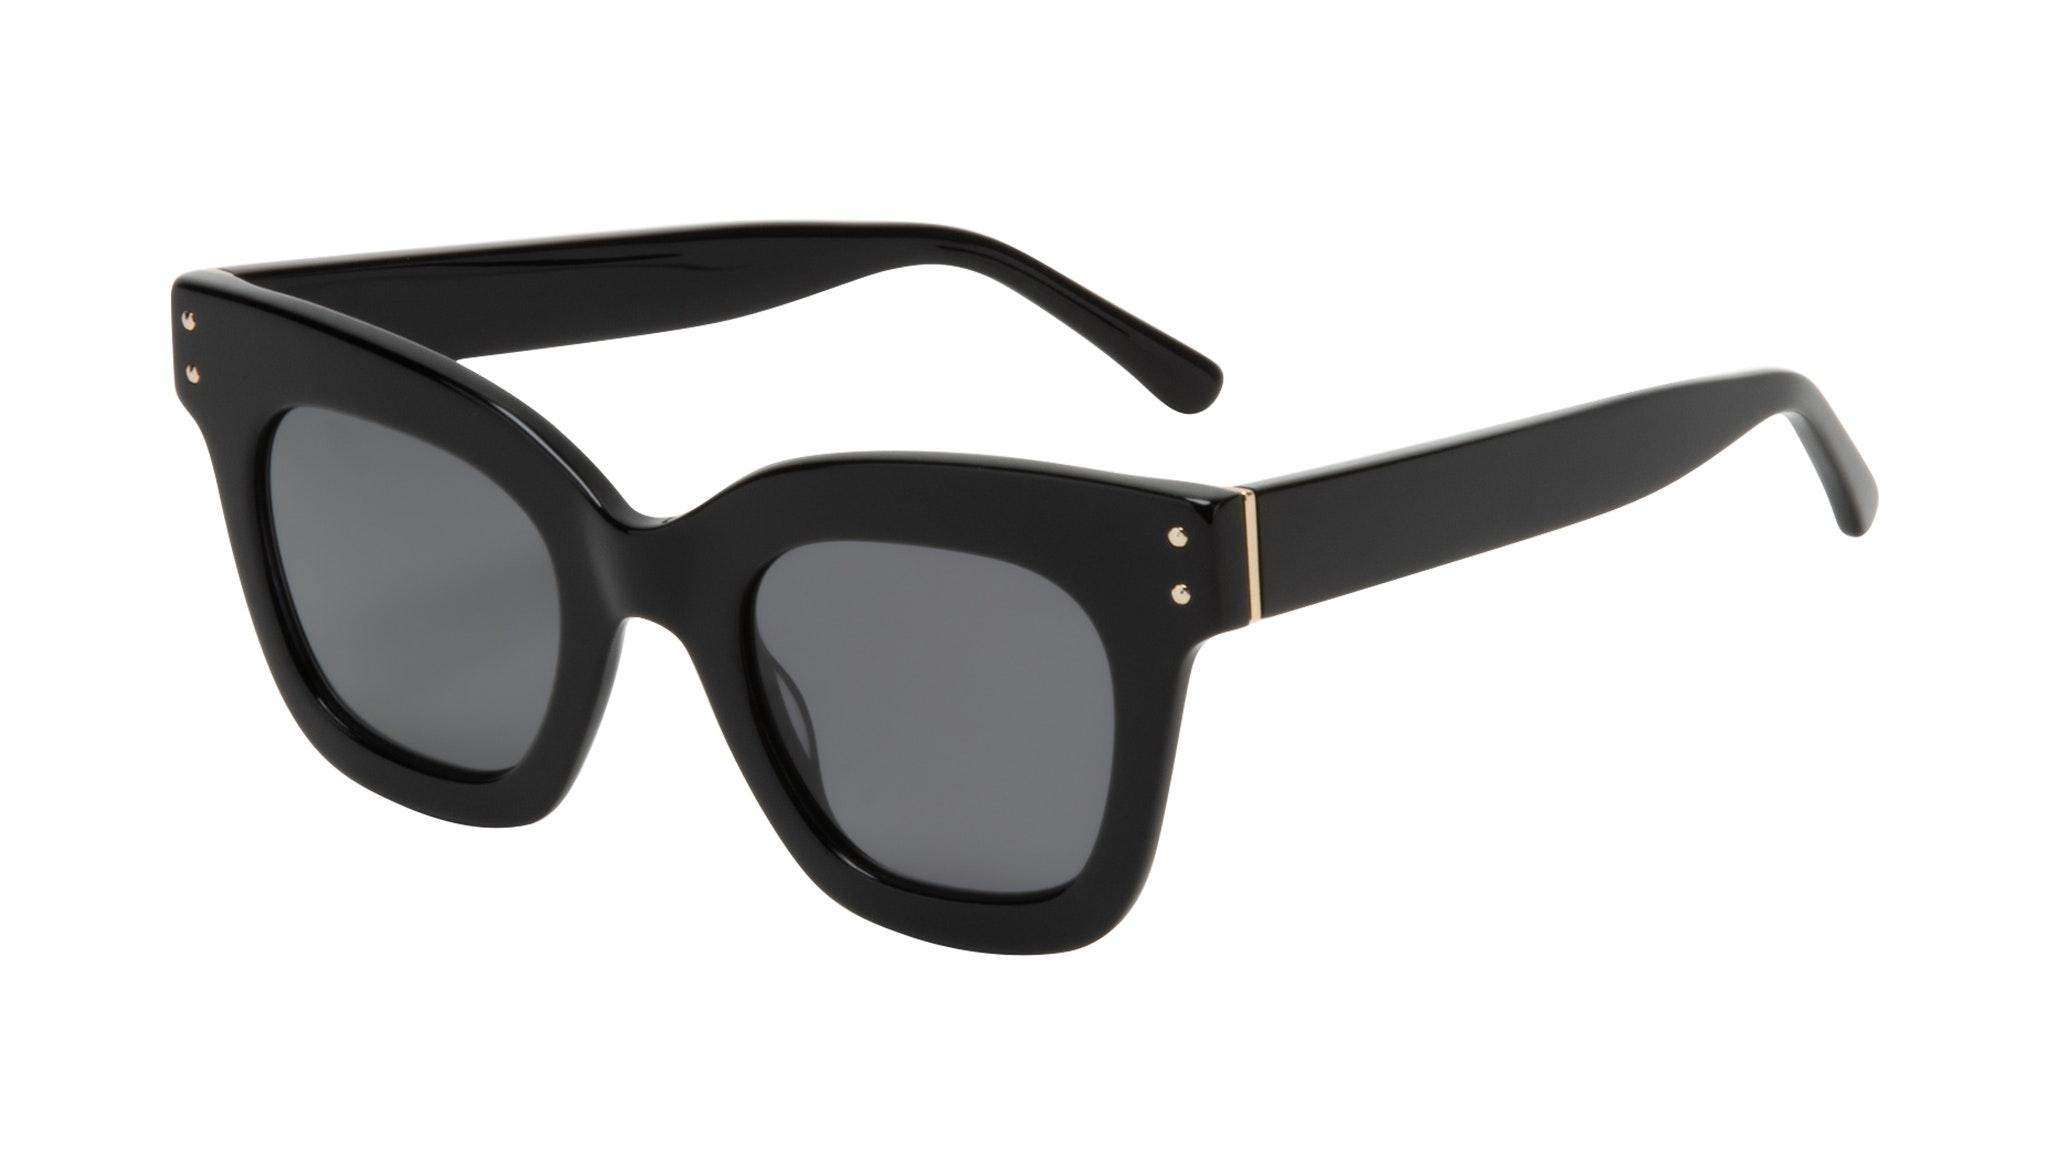 Affordable Fashion Glasses Square Sunglasses Women Fever Onyx Tilt